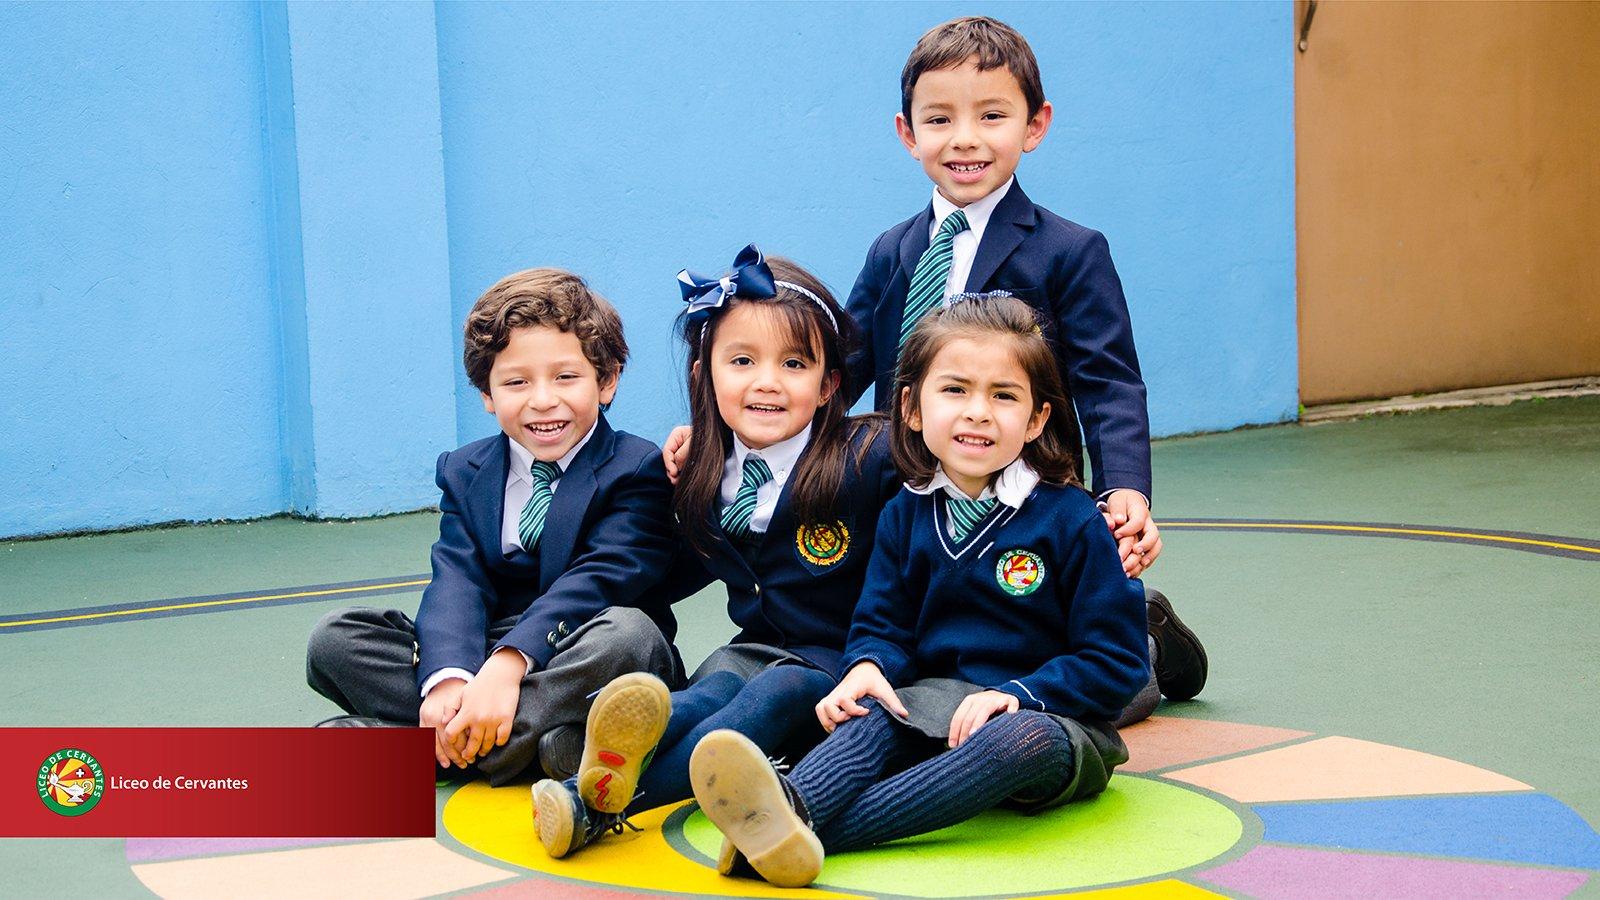 Liceo de Cervantes